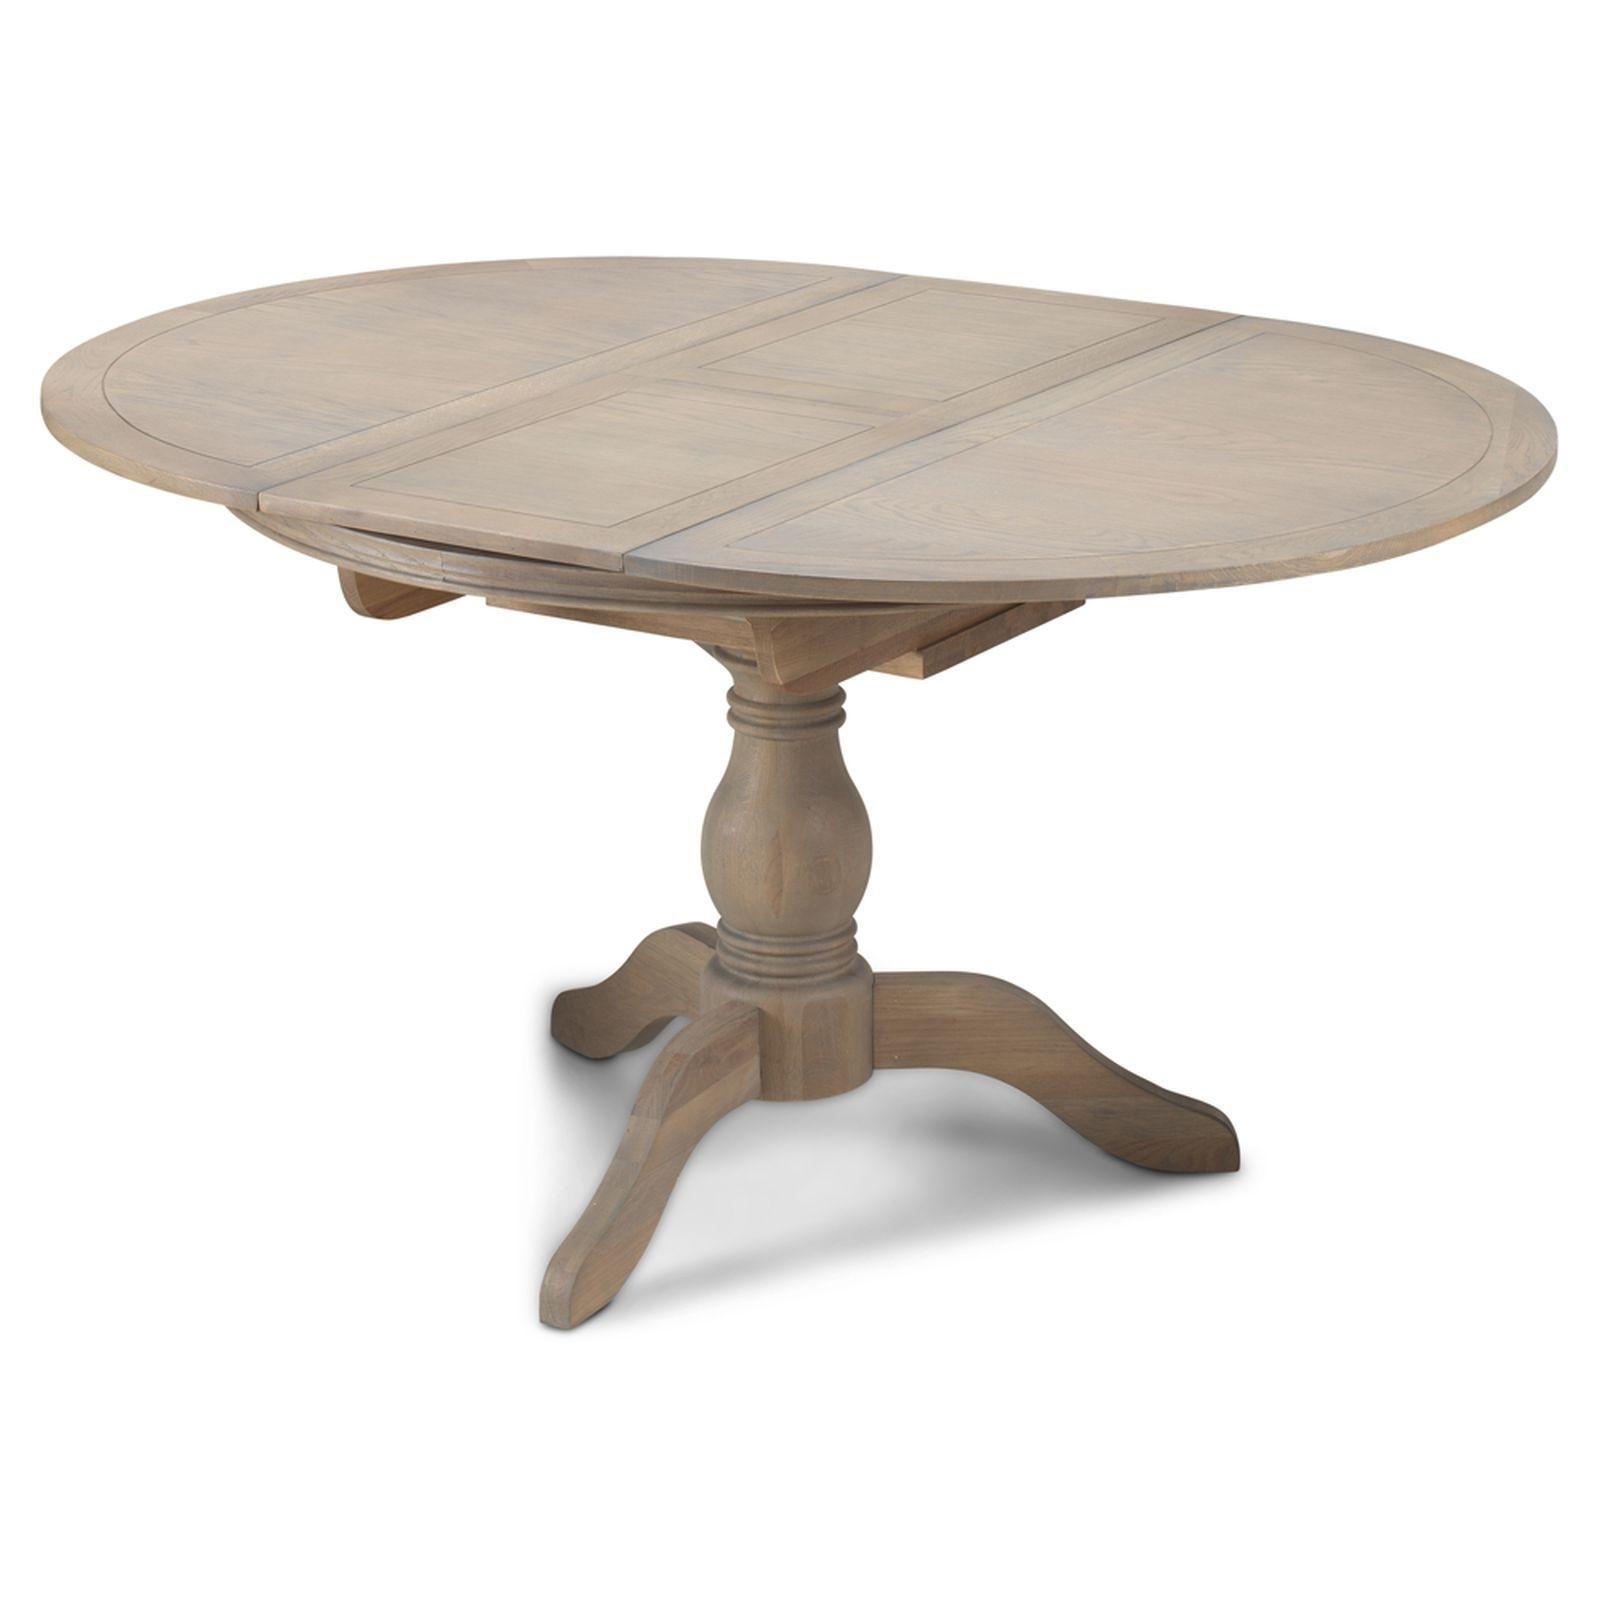 Circular Oak Dining Tables Regarding Most Popular Paloma Oak Furniture Grey Extending Round Circular Dining Table  (View 9 of 25)